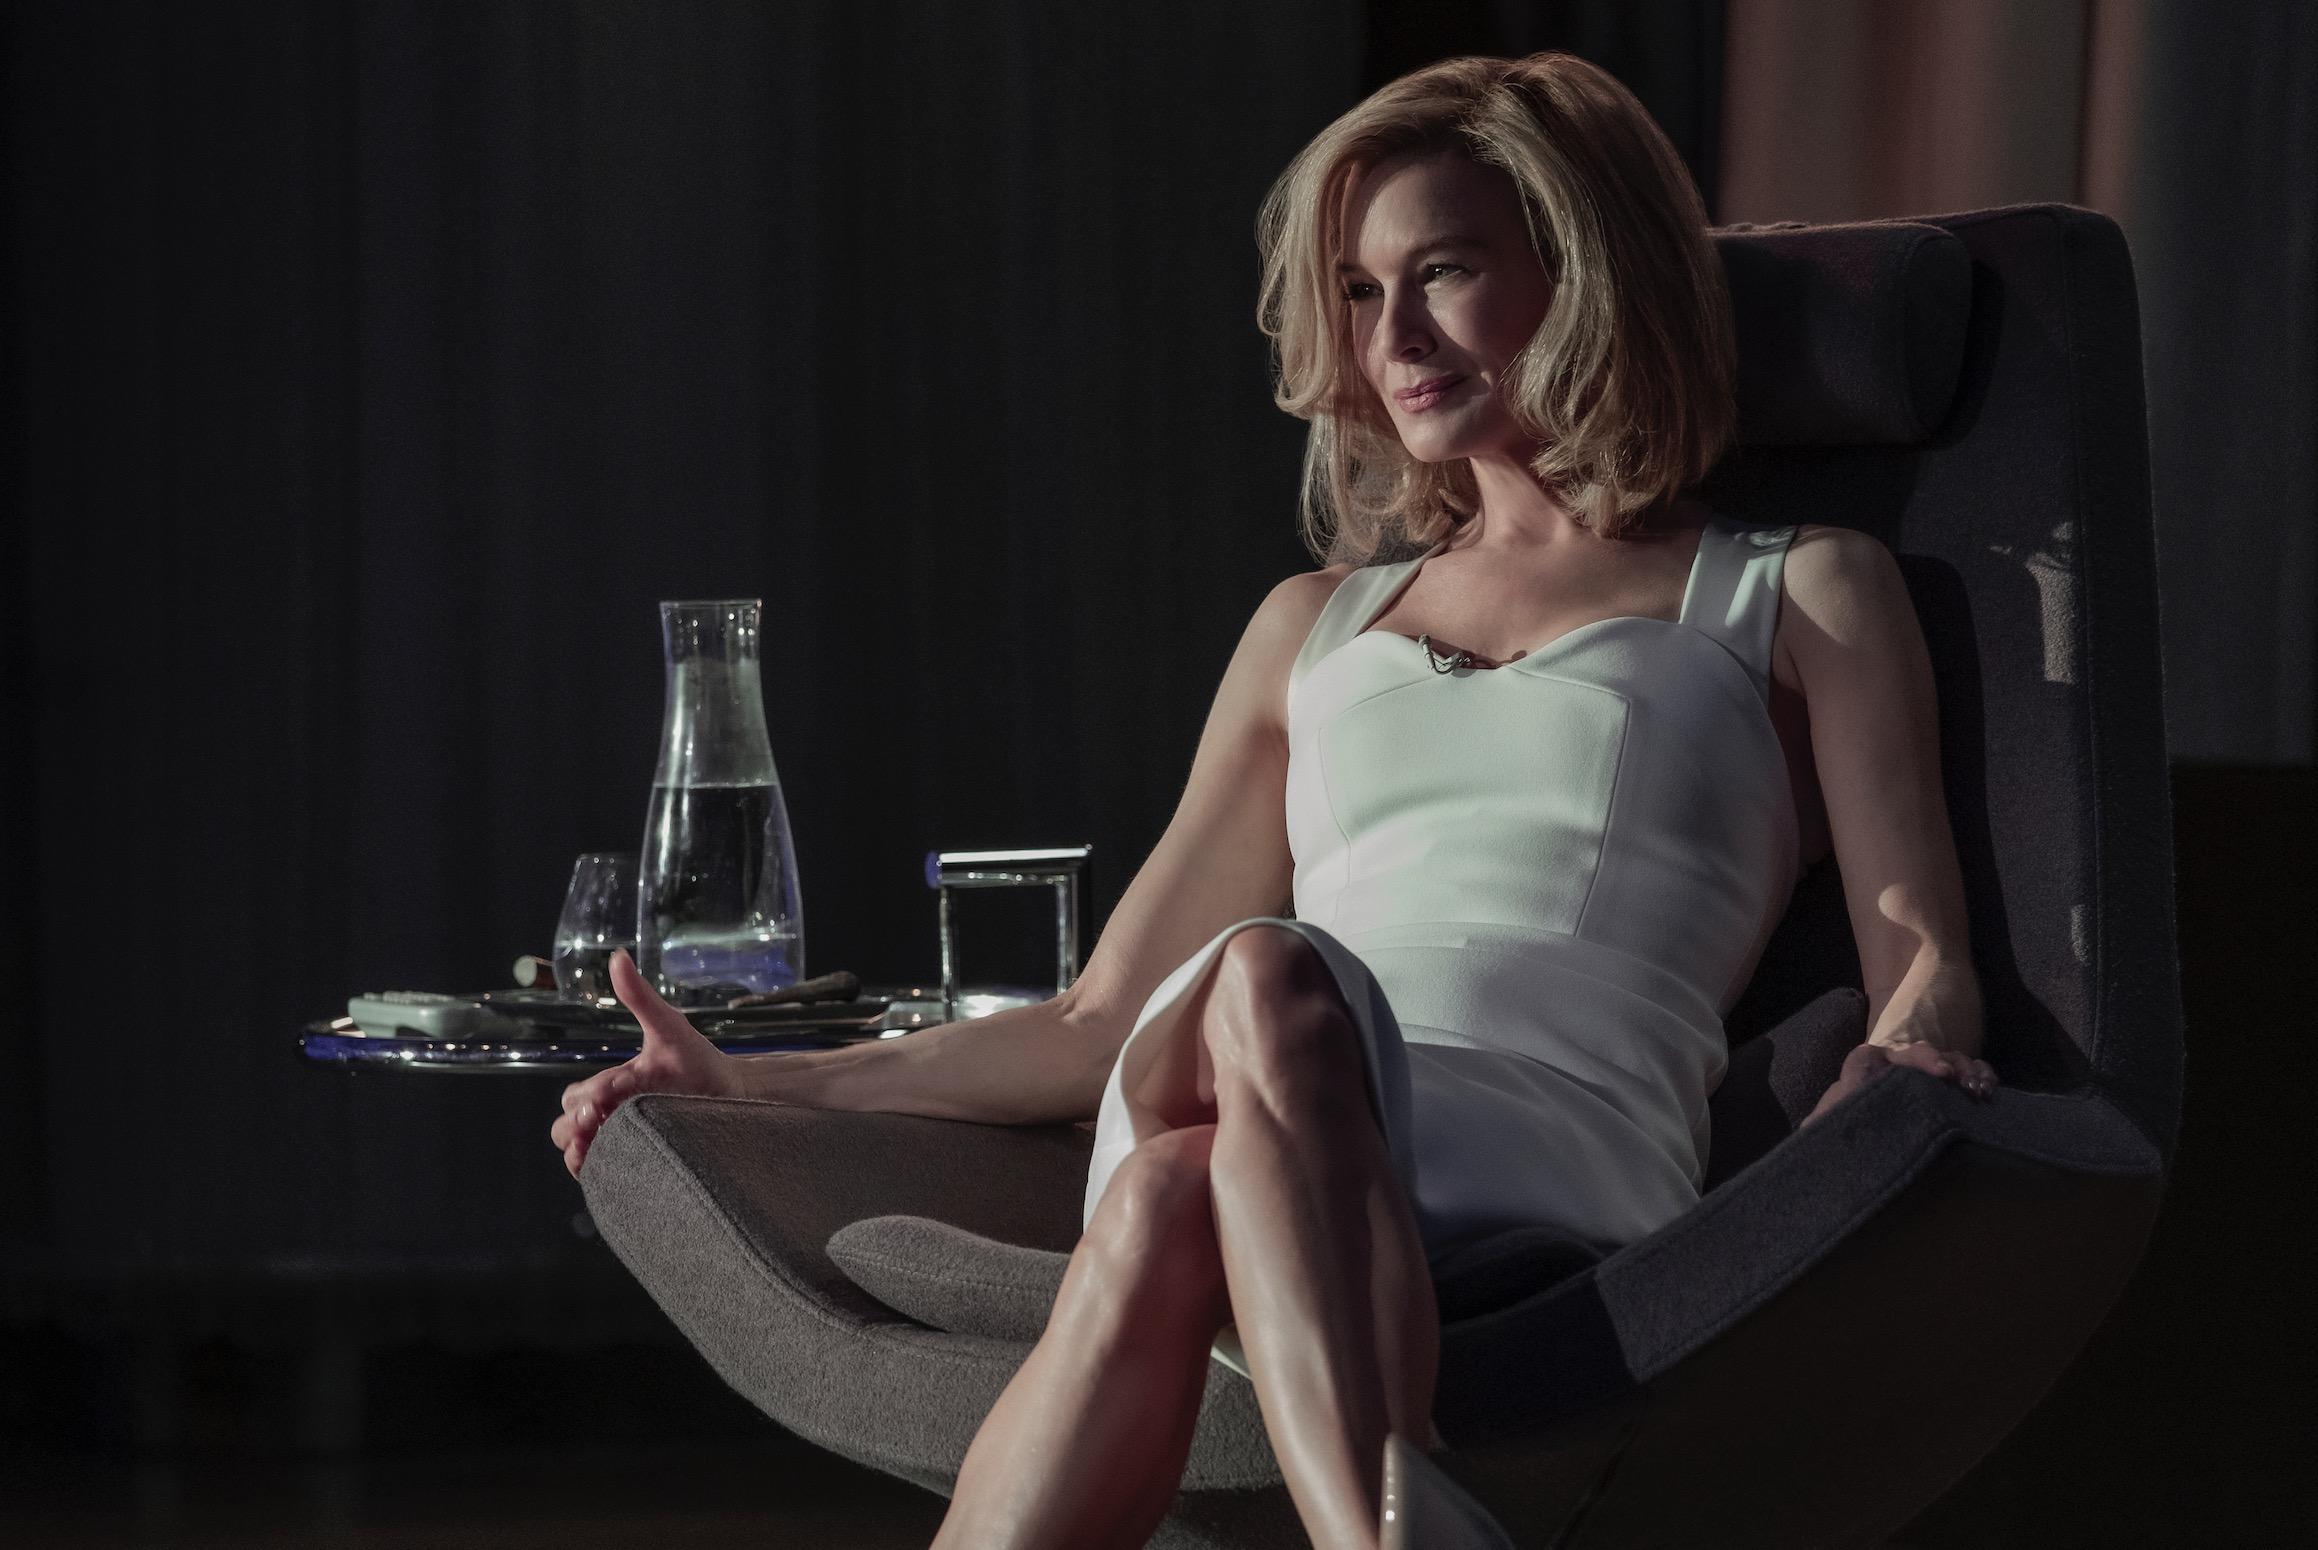 Renee Zellweger image - Netflix